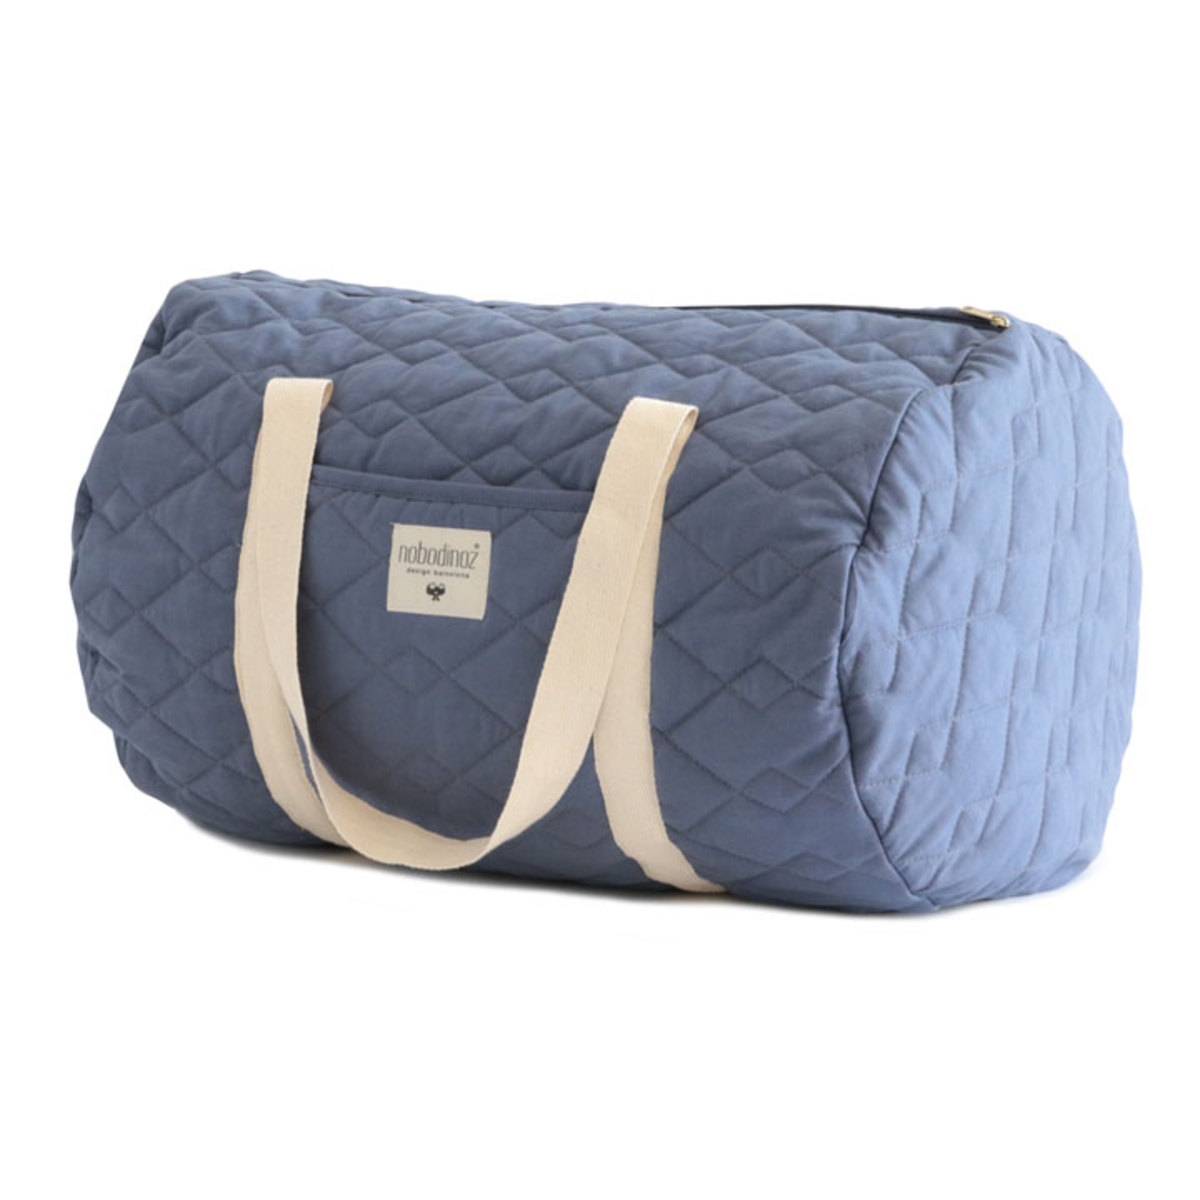 nobodinoz sac week end los angeles pure line bleu oc an sac langer nobodinoz sur l 39 armoire. Black Bedroom Furniture Sets. Home Design Ideas